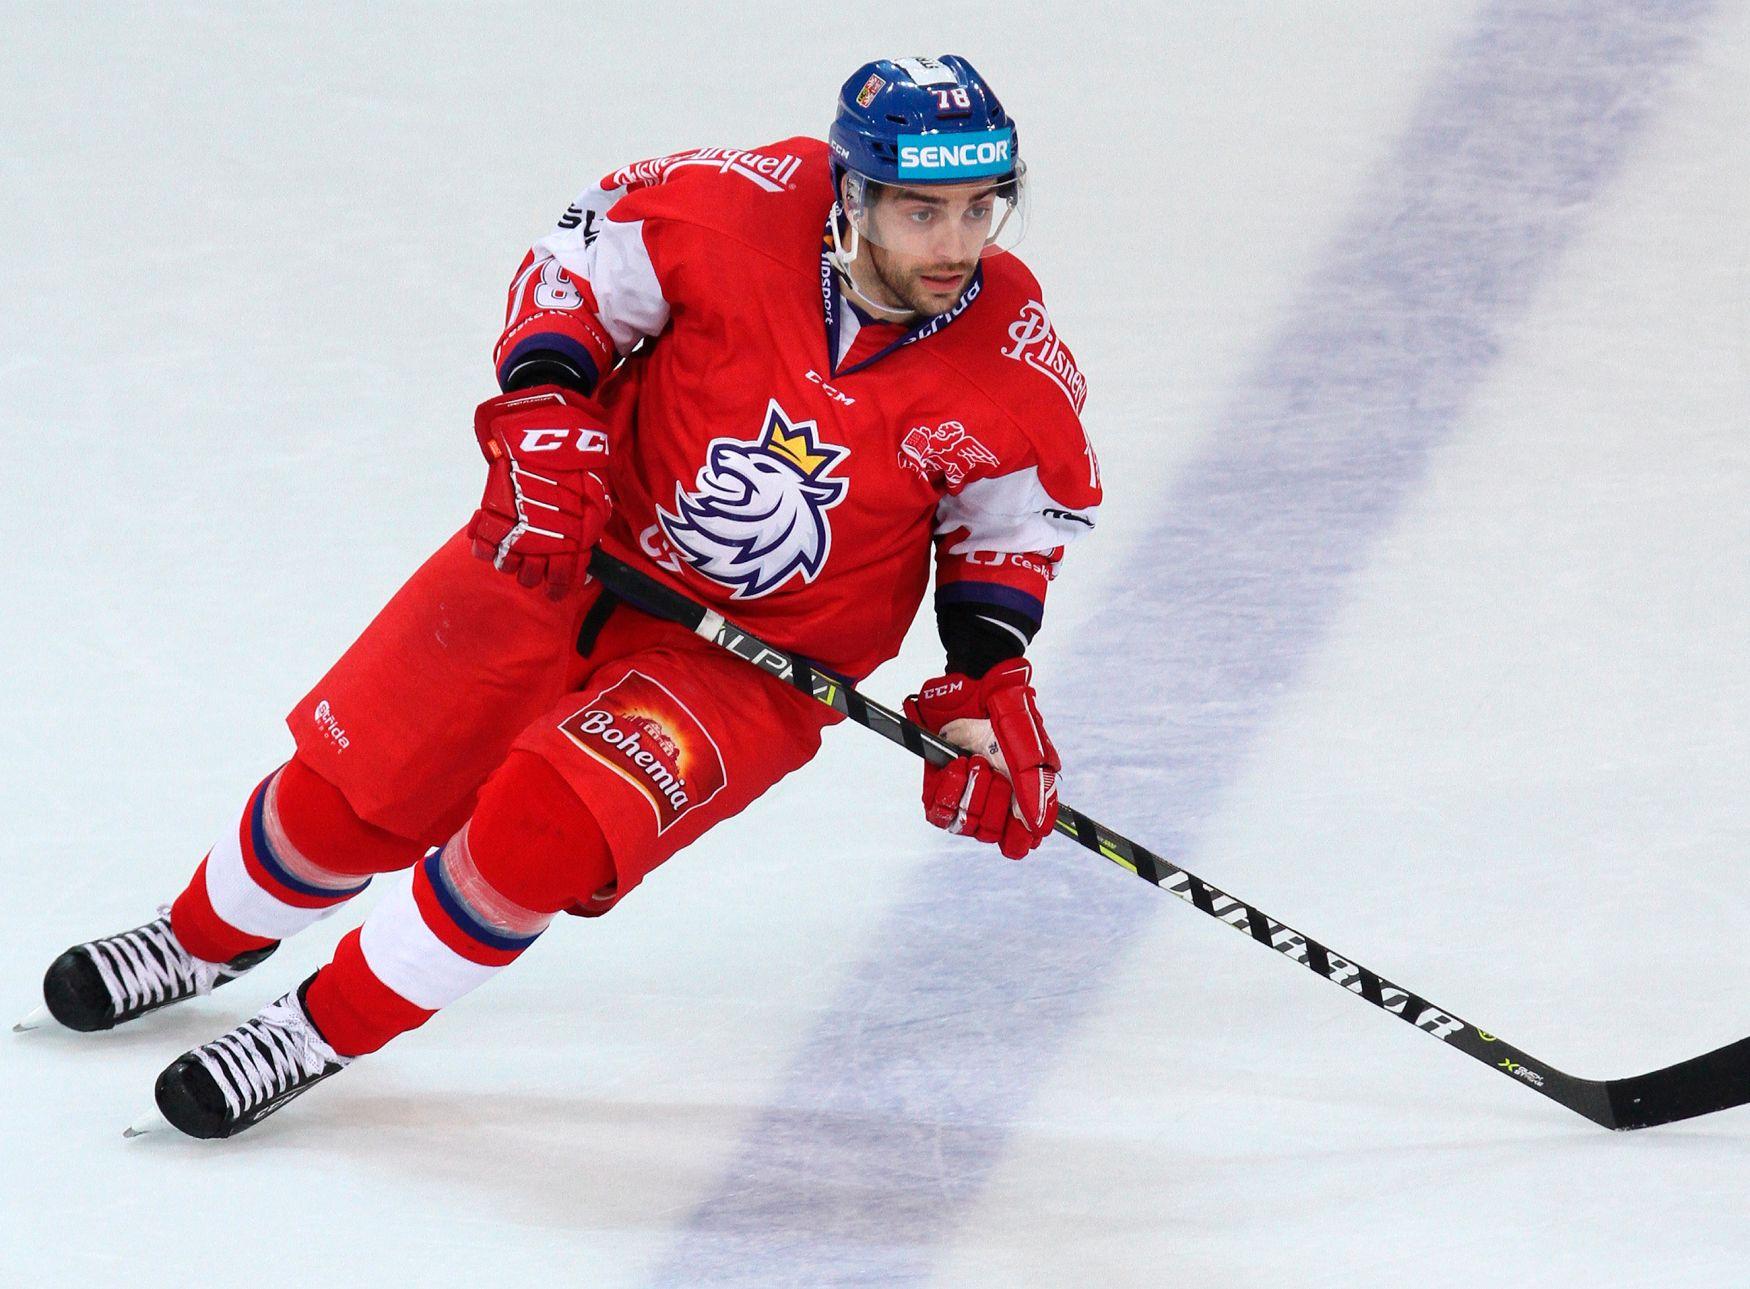 https://sport.aktualne.cz/robin-hanzl-hokejovy-utocnik/r~c246d61e44b911e9ad610cc47ab5f122/r~562b17b044b911e98a200cc47ab5f122/